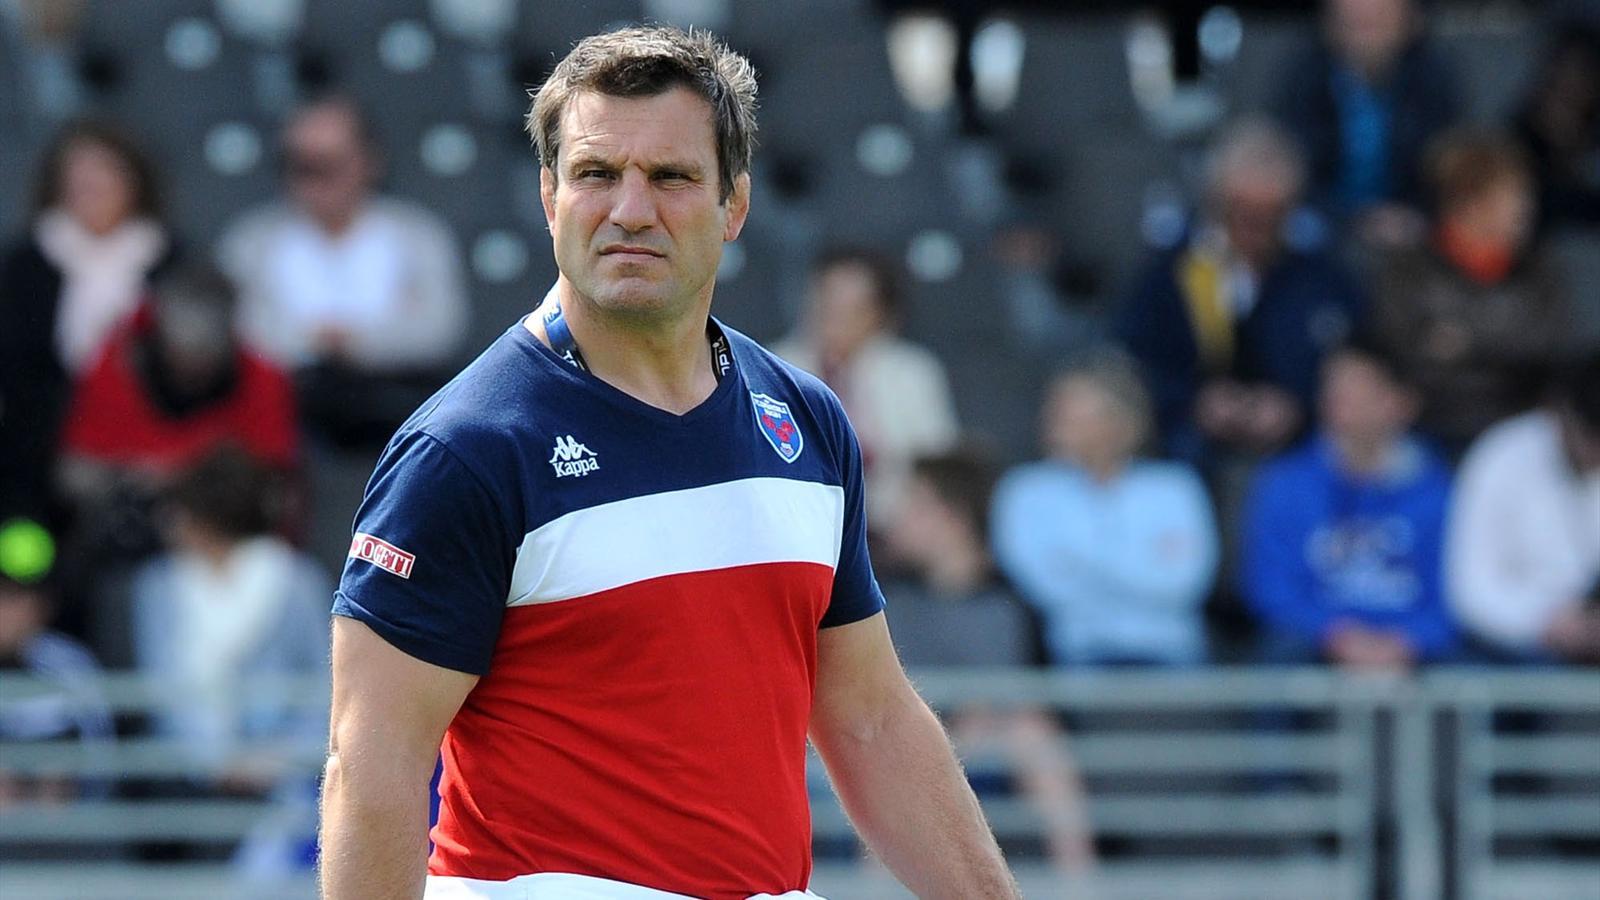 Le manager de Grenoble, Fabrice Landreau - mai 2015